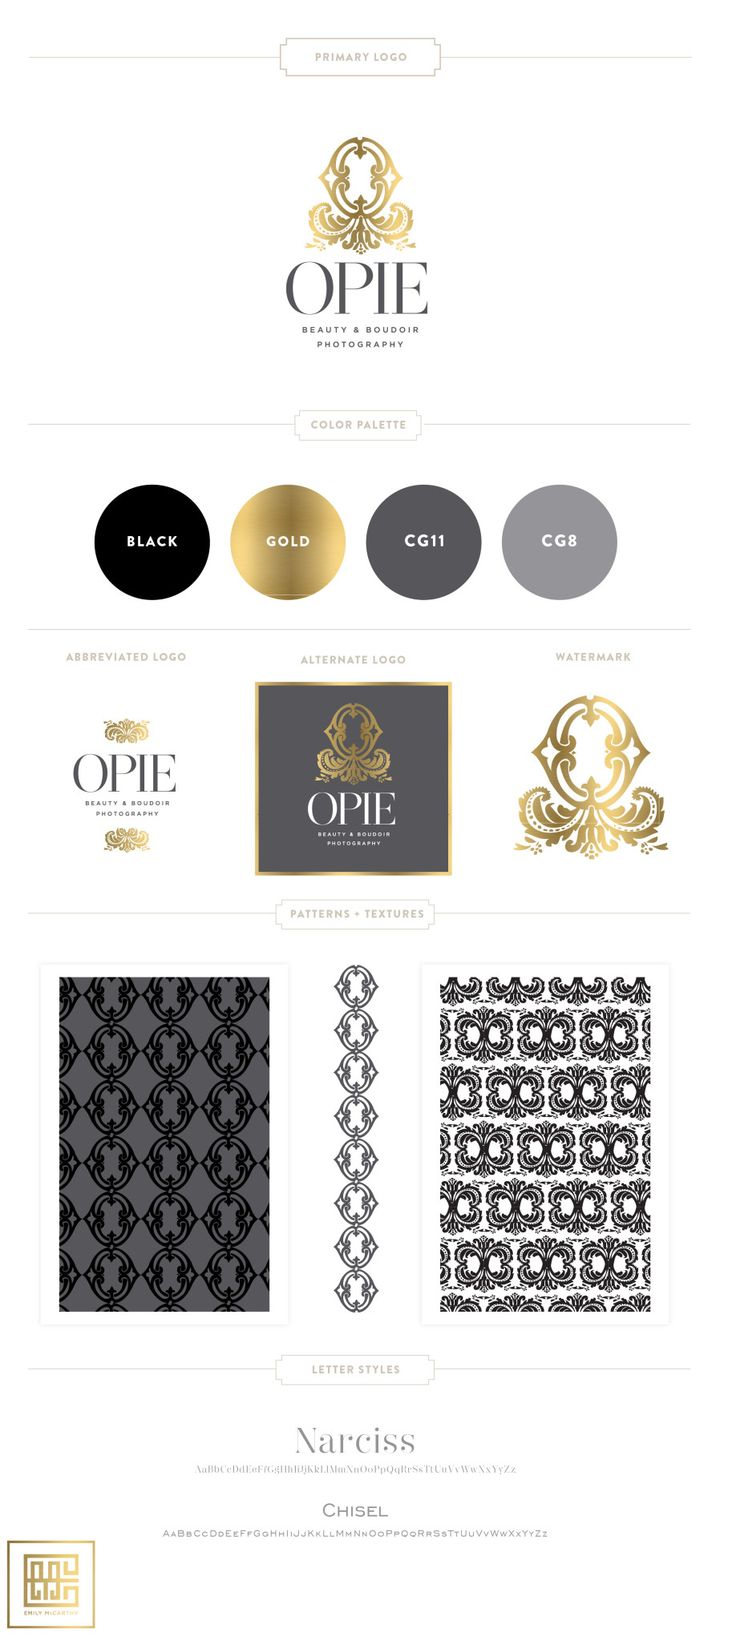 Emily McCarthy Branding Design   Opie Beauty & Boudoir Photography Branding…